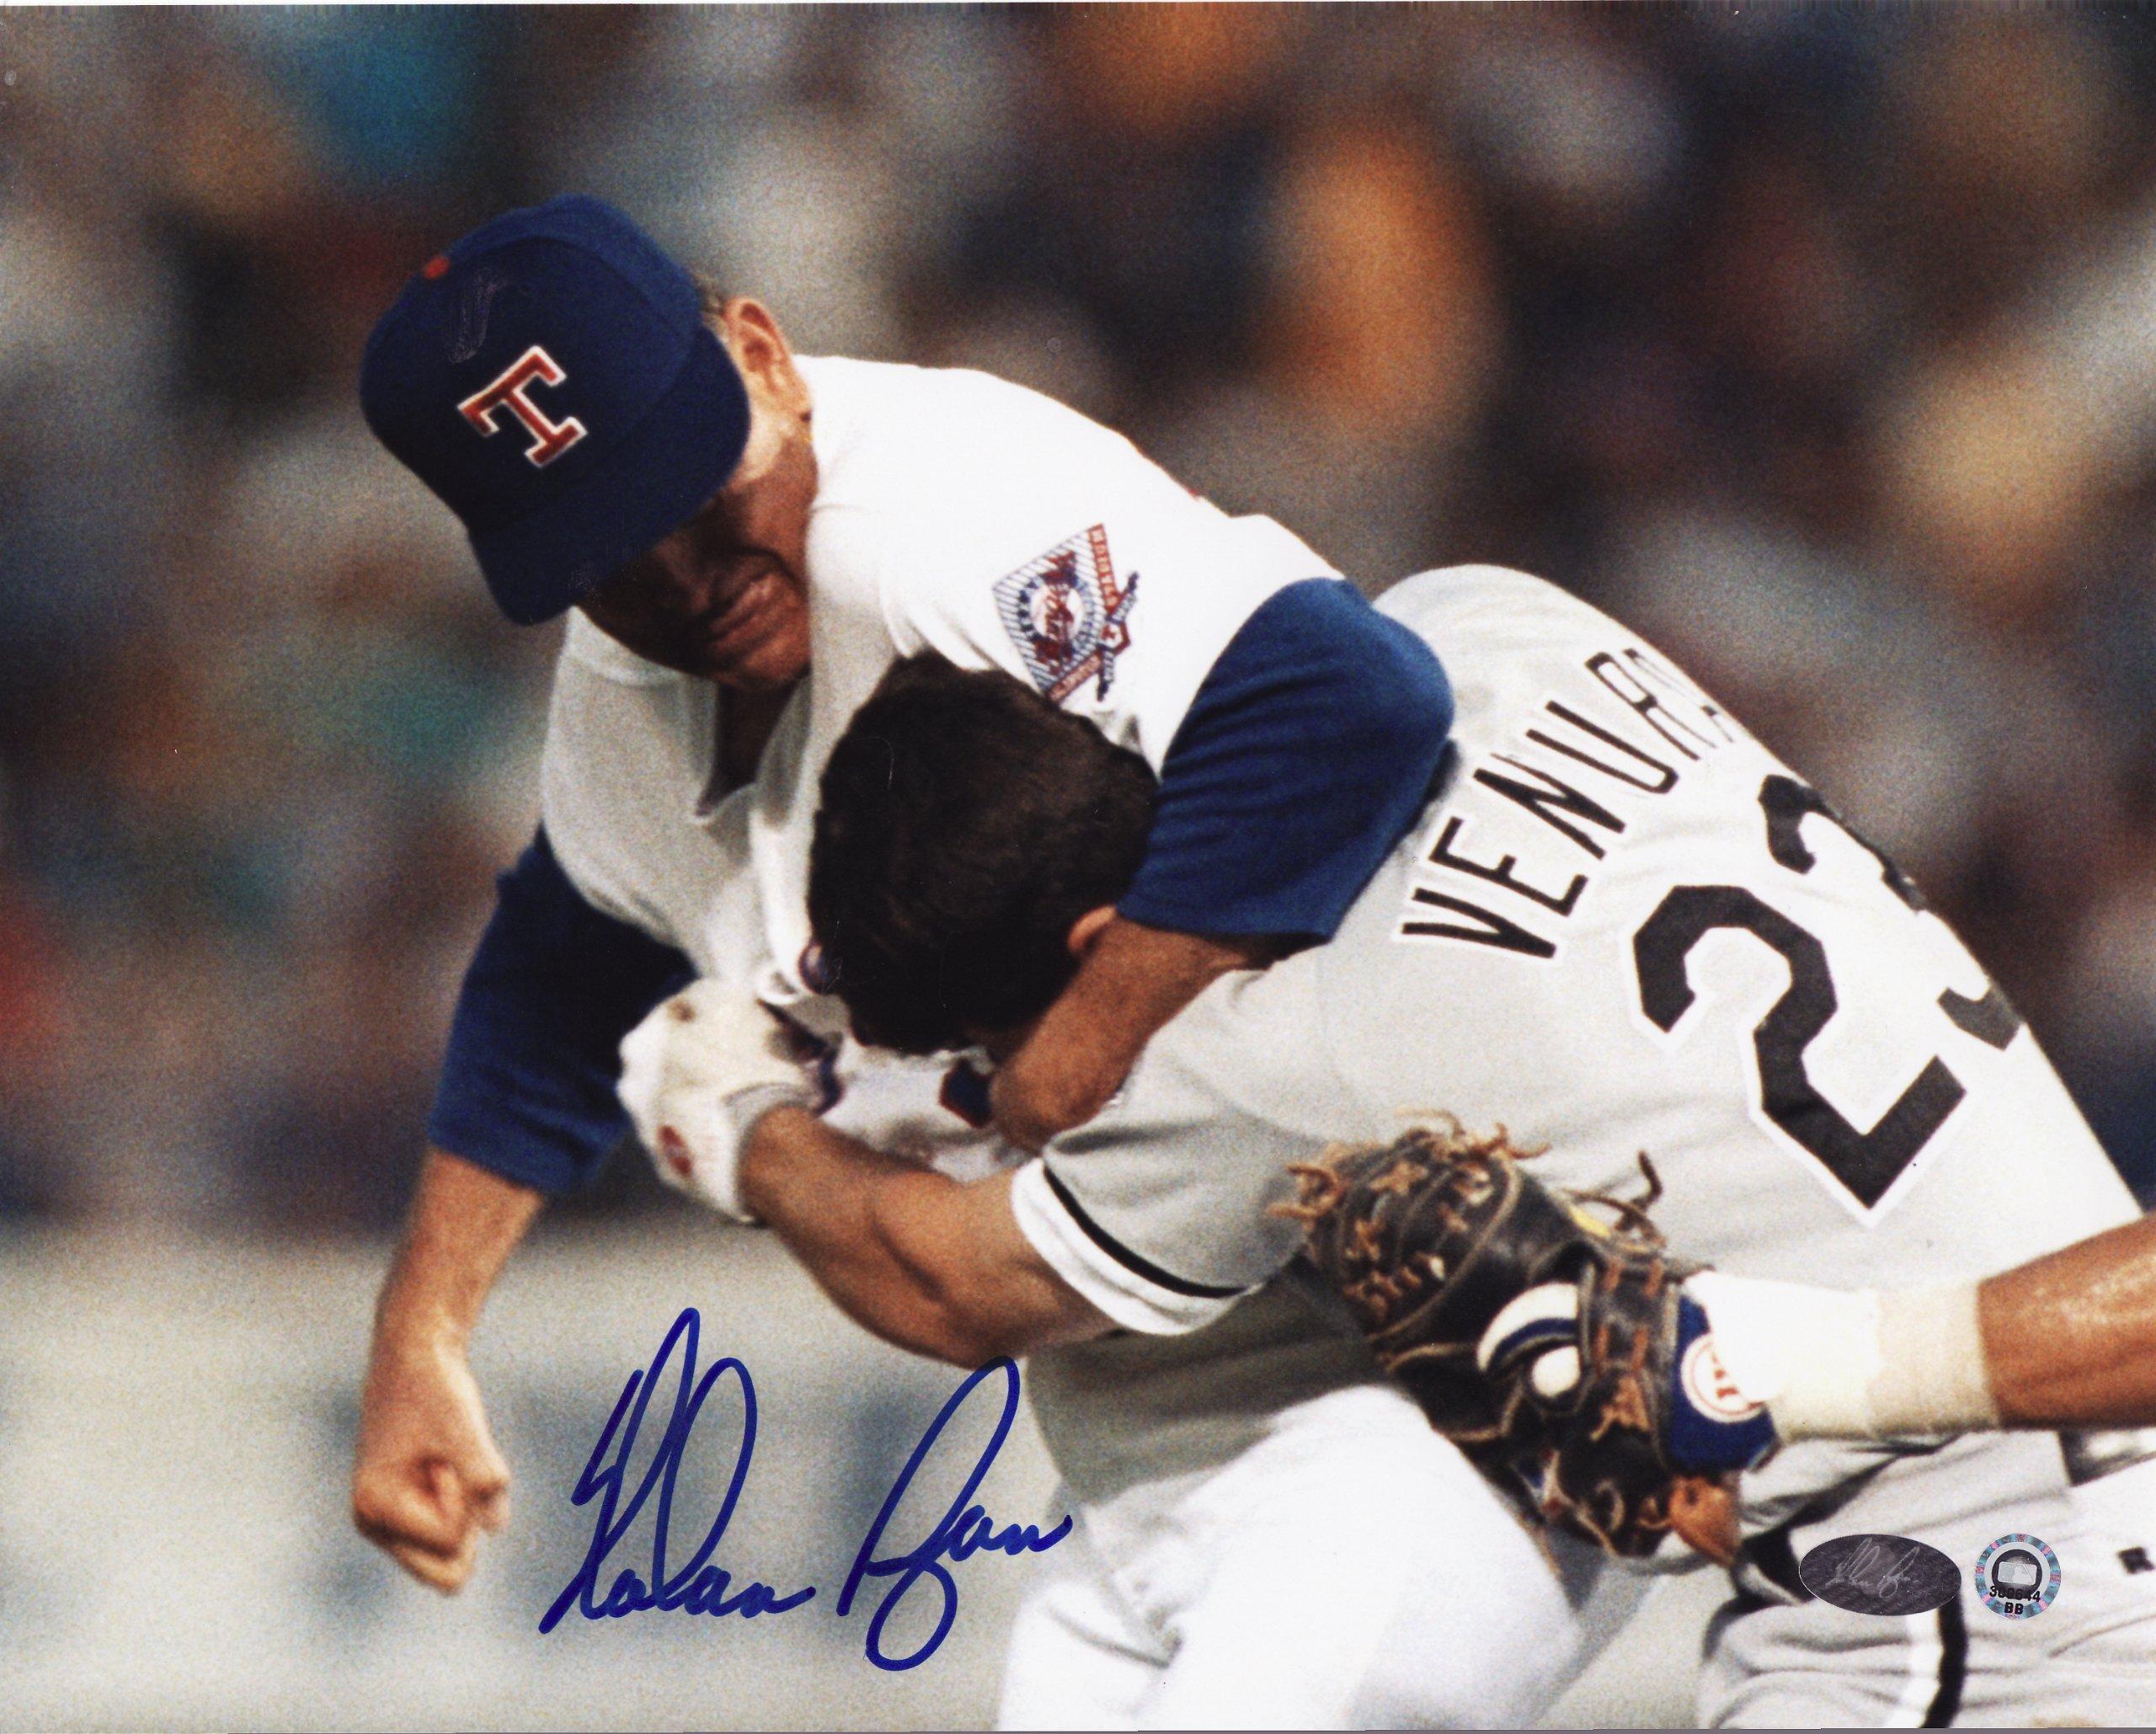 Nolan Ryan vs Ventura reprint 8x10 Photo Texas Rangers Mint Condition